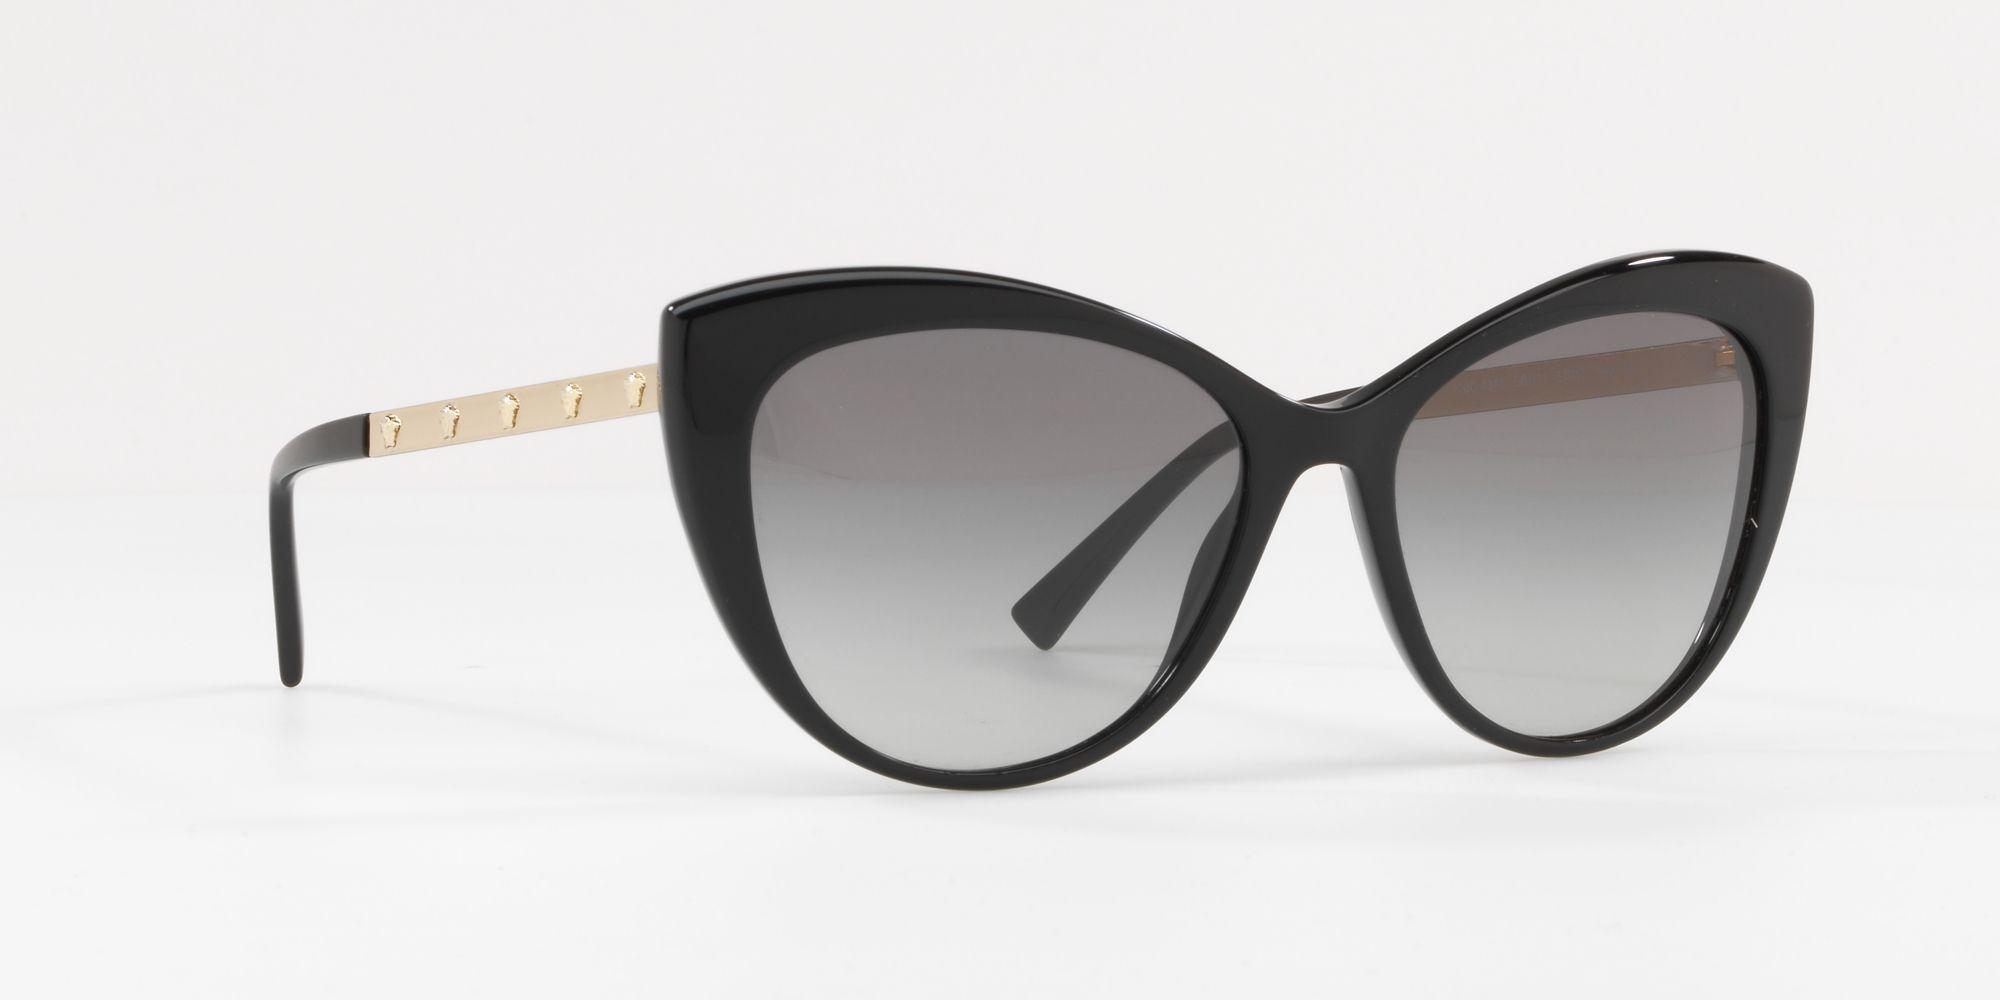 760f49e67c92 Versace Black 0ve4348 Cat Eye Sunglasses in Black - Lyst